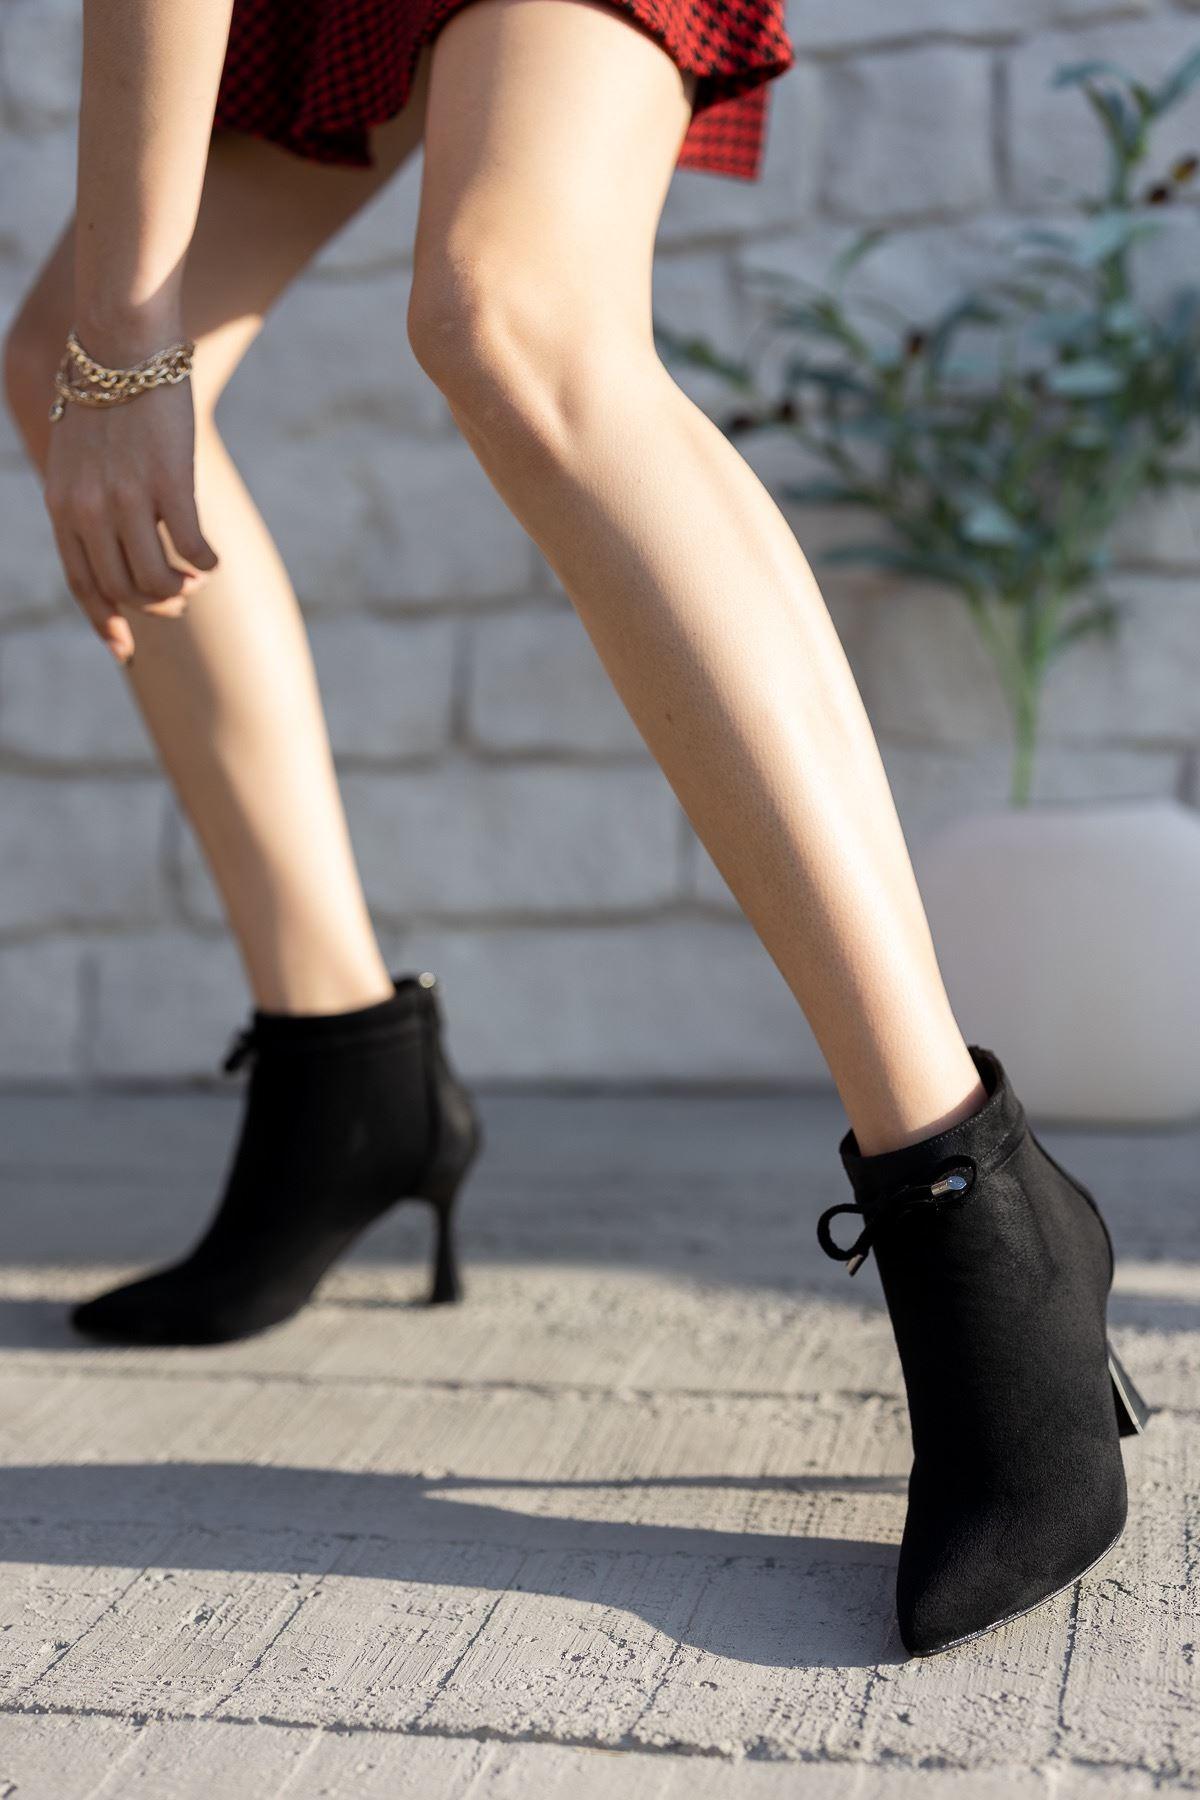 Kadın Minke Yüksek Kadeh Topuklu Siyah Süet Bot